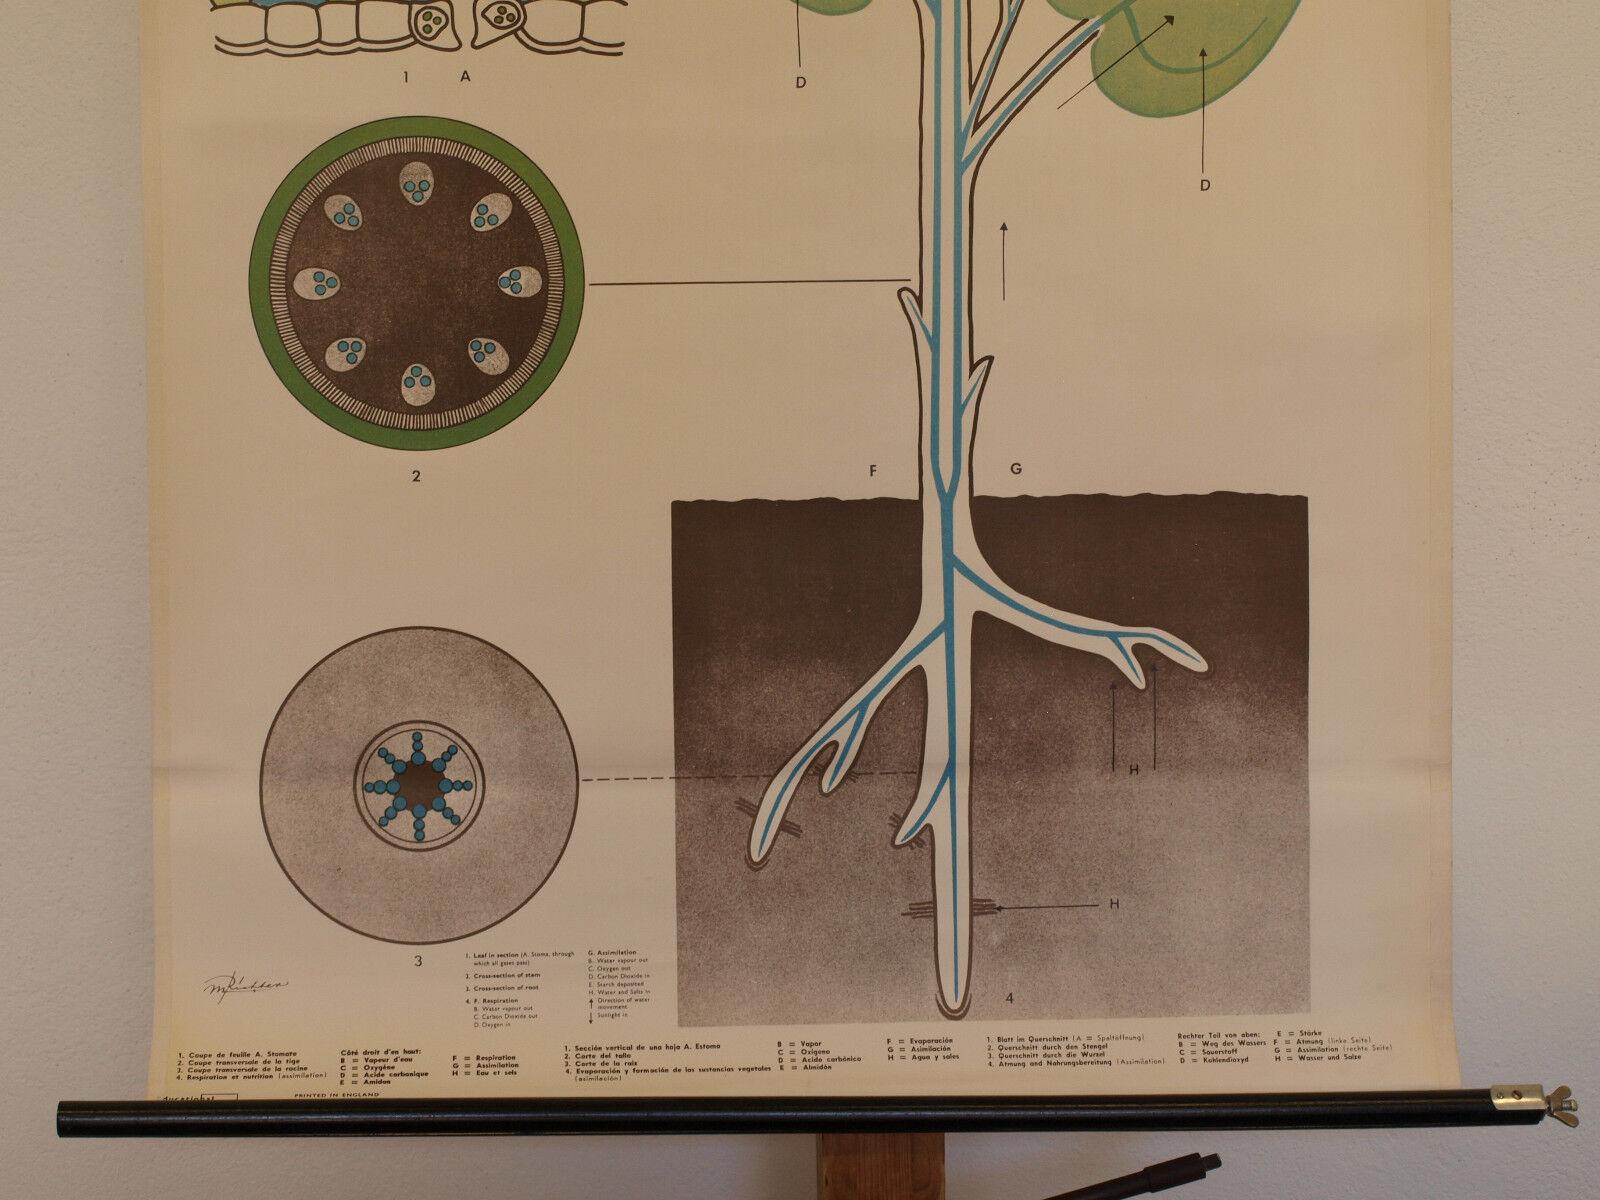 Quadro su Tela Das Leben Der Piante Costruzione Radice Radice Radice Gambo Fiore 72x98cm 1955 c8f337